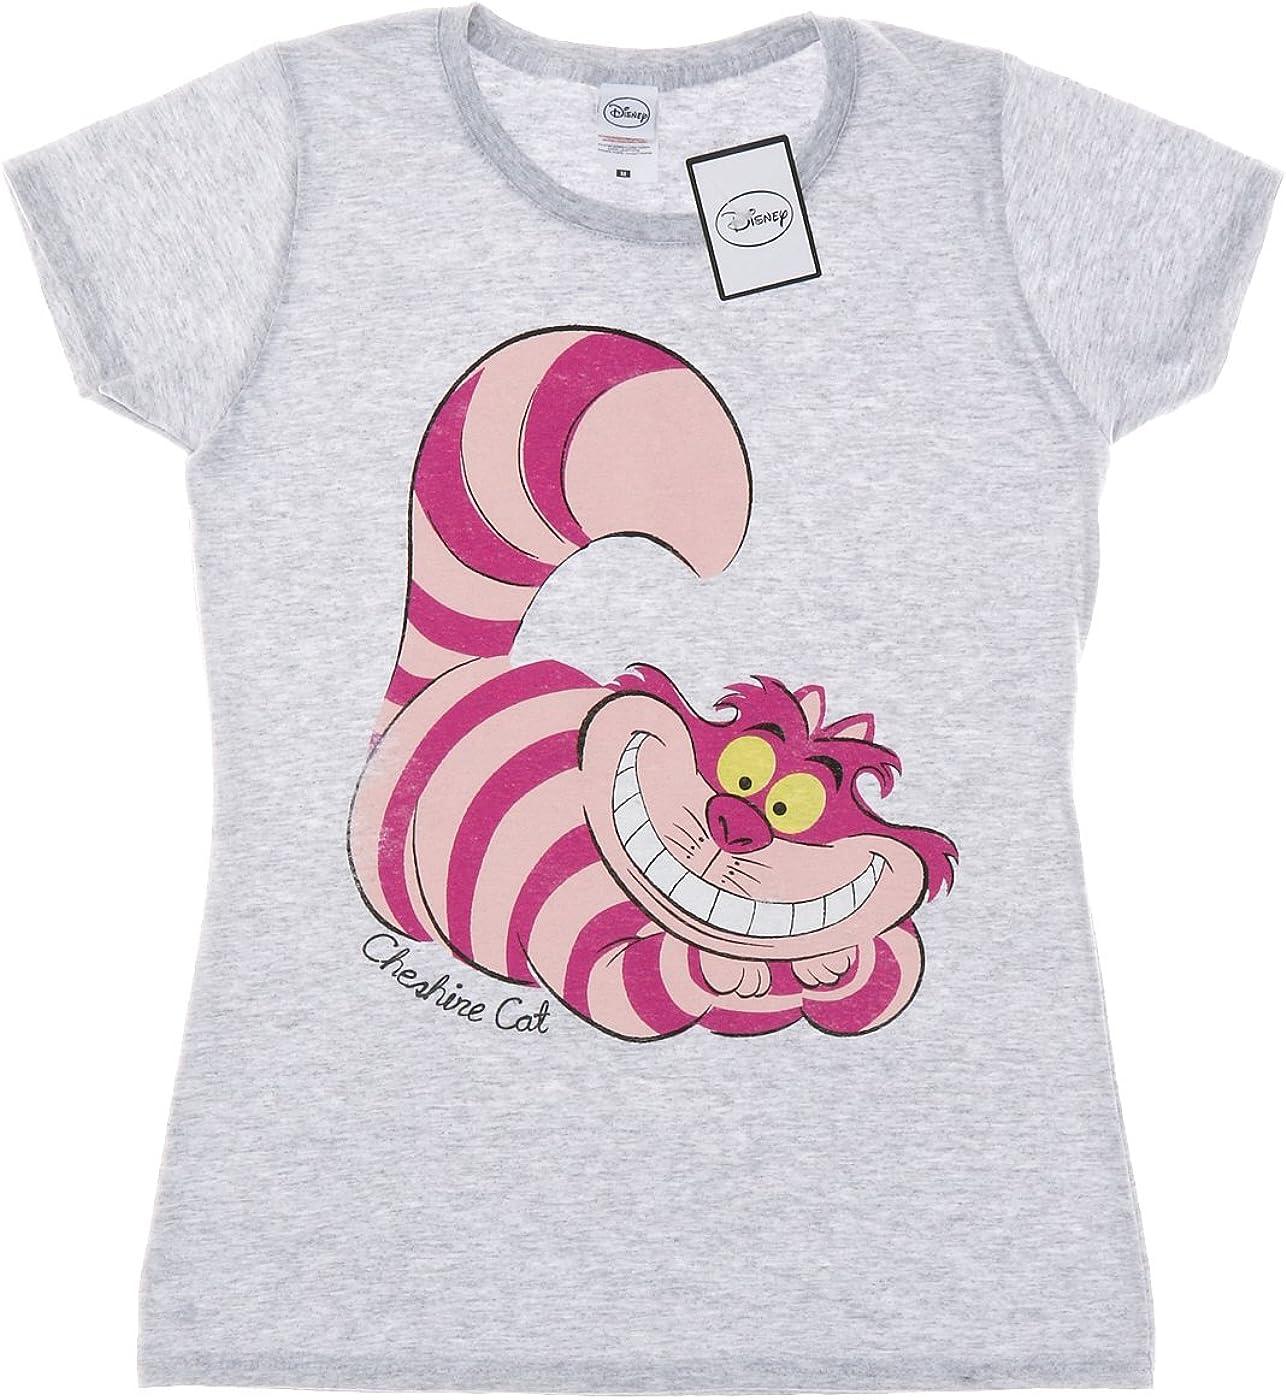 Disney Femme Alice In Wonderland Cheshire Cat T-shirt